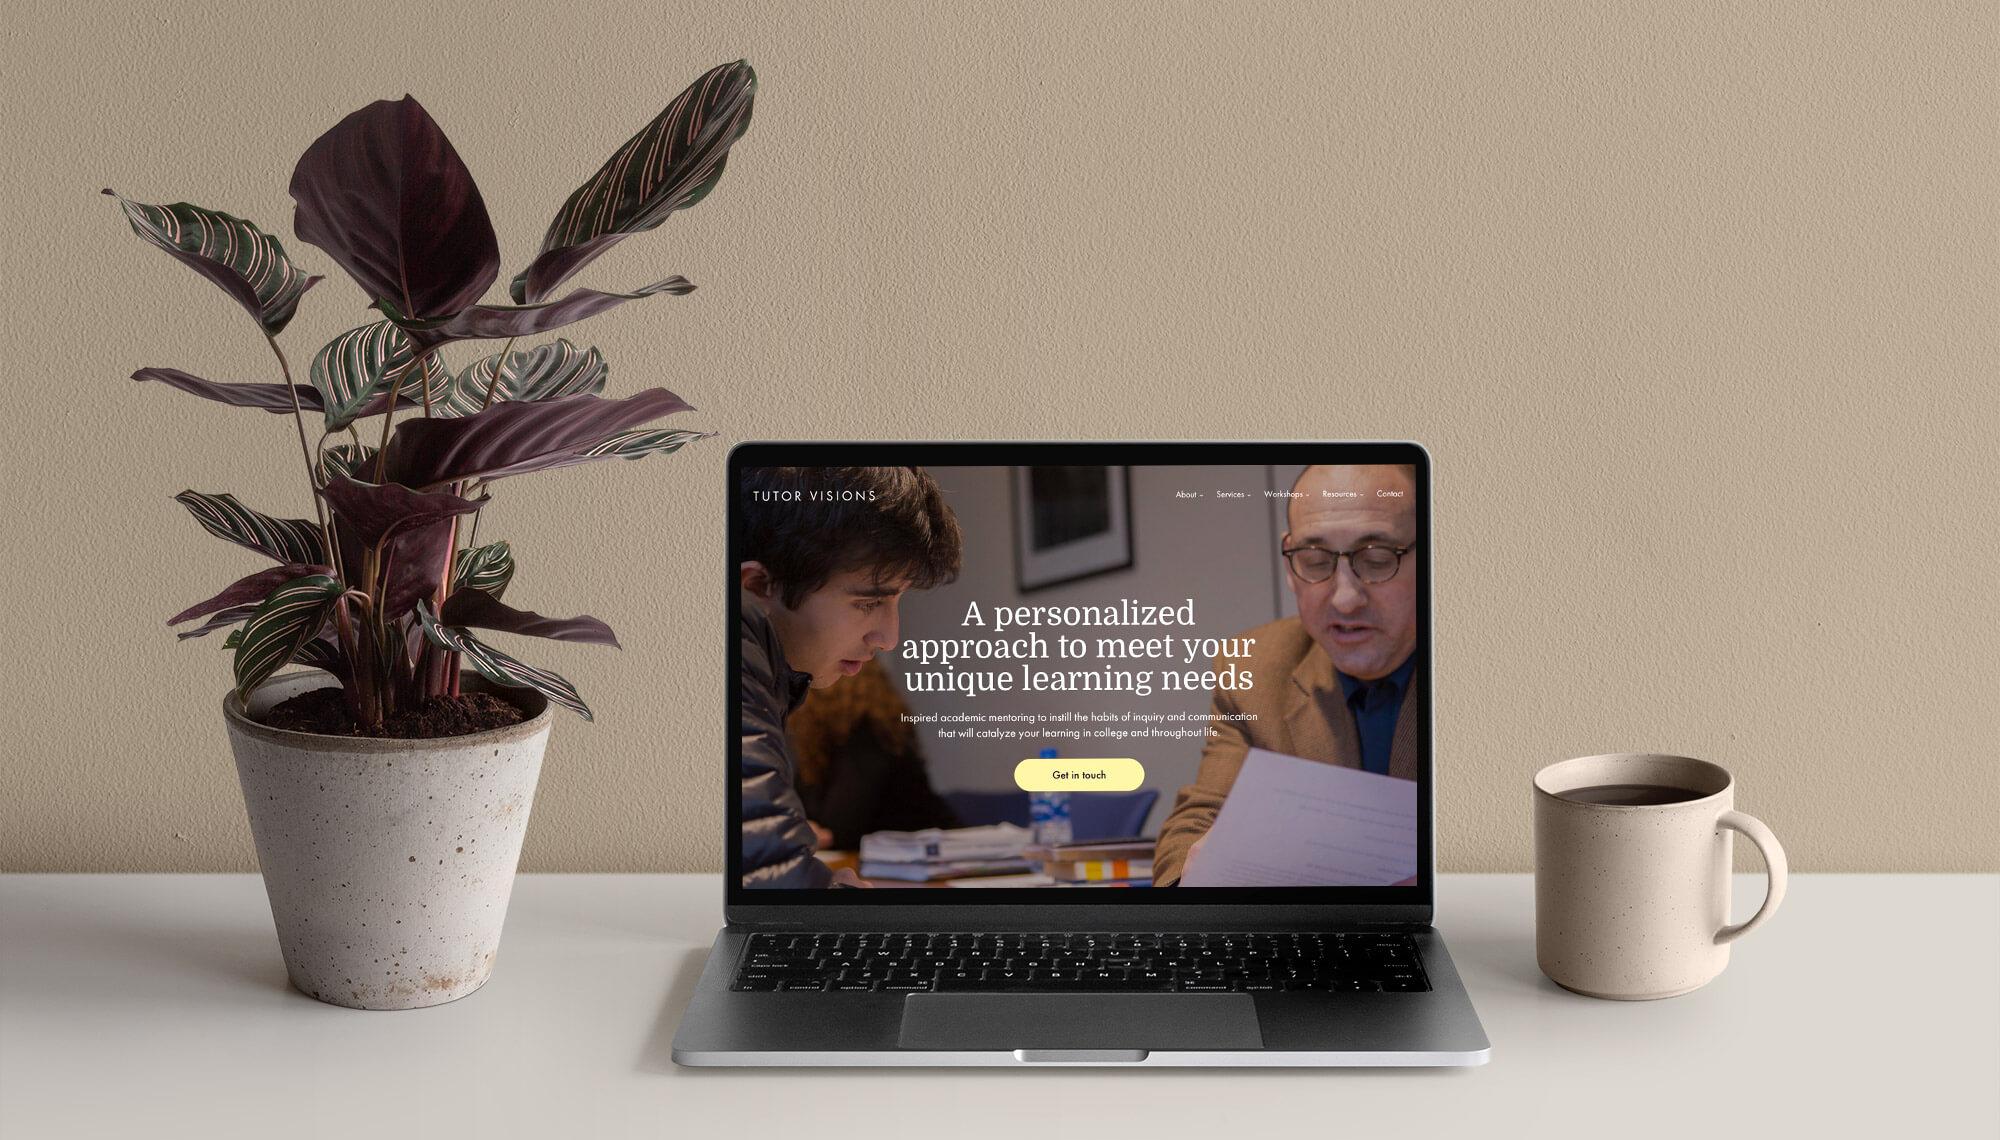 Tutor Visions Website Design and Development